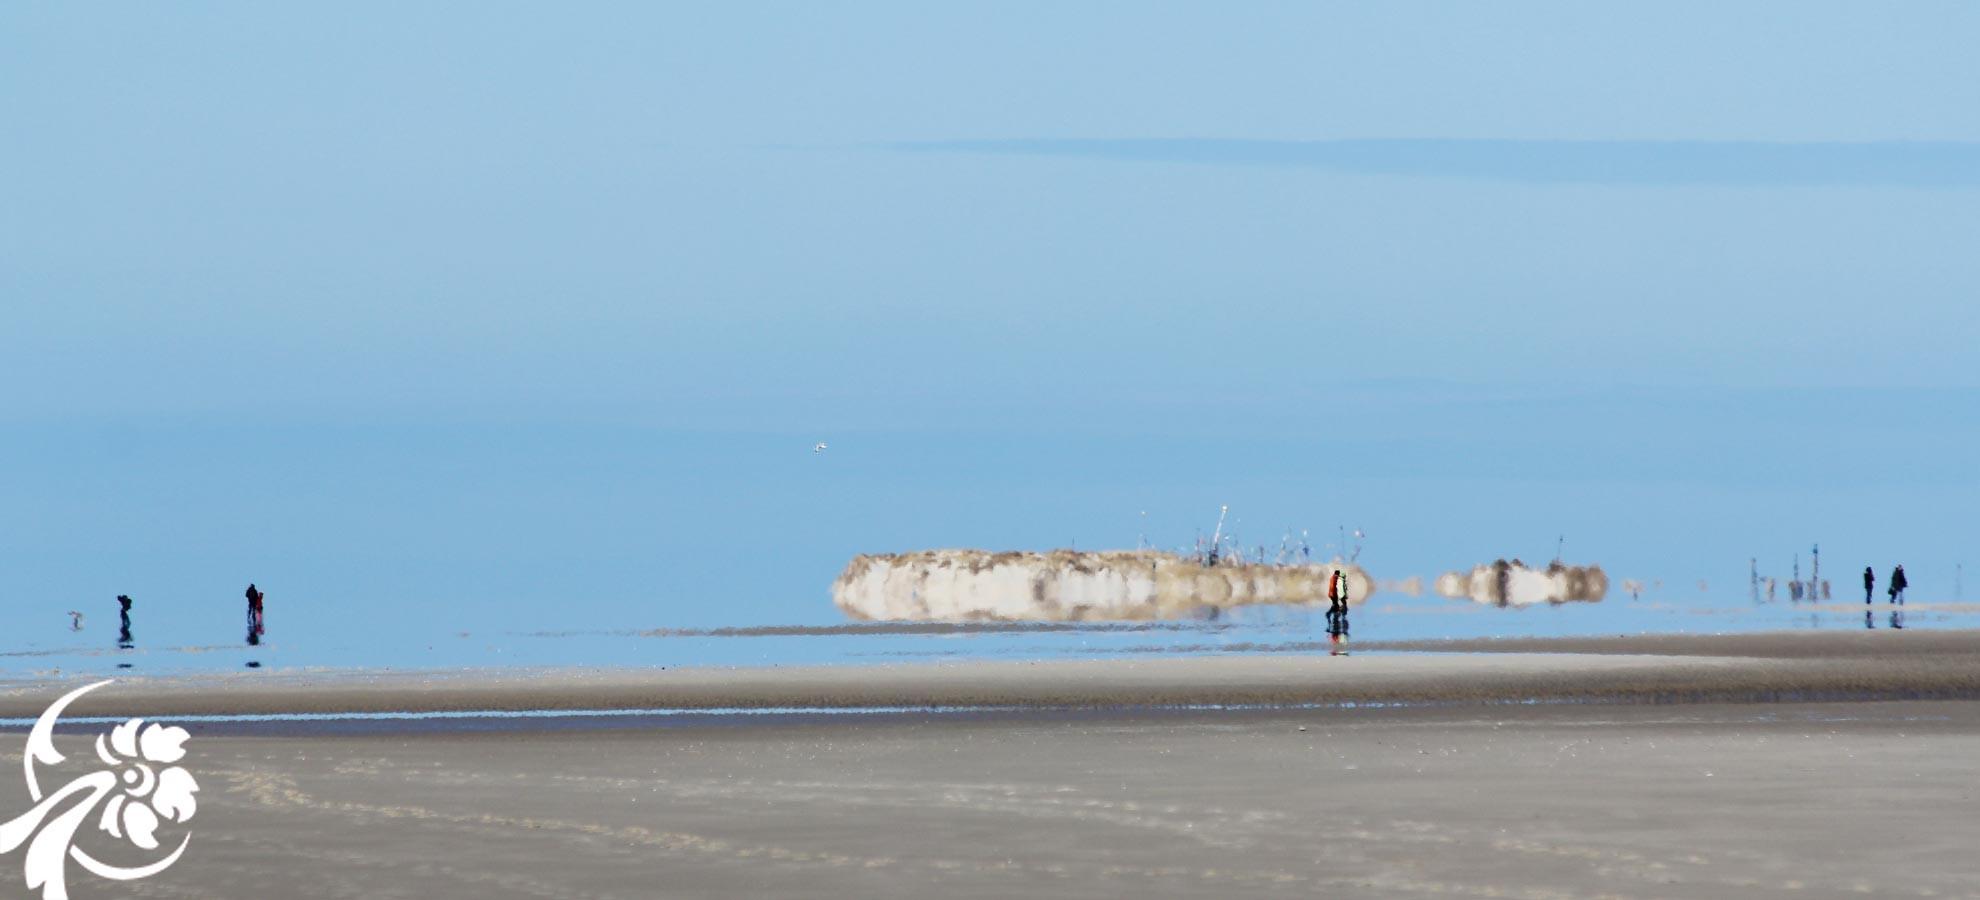 petersen-amrum-strandspaziergang